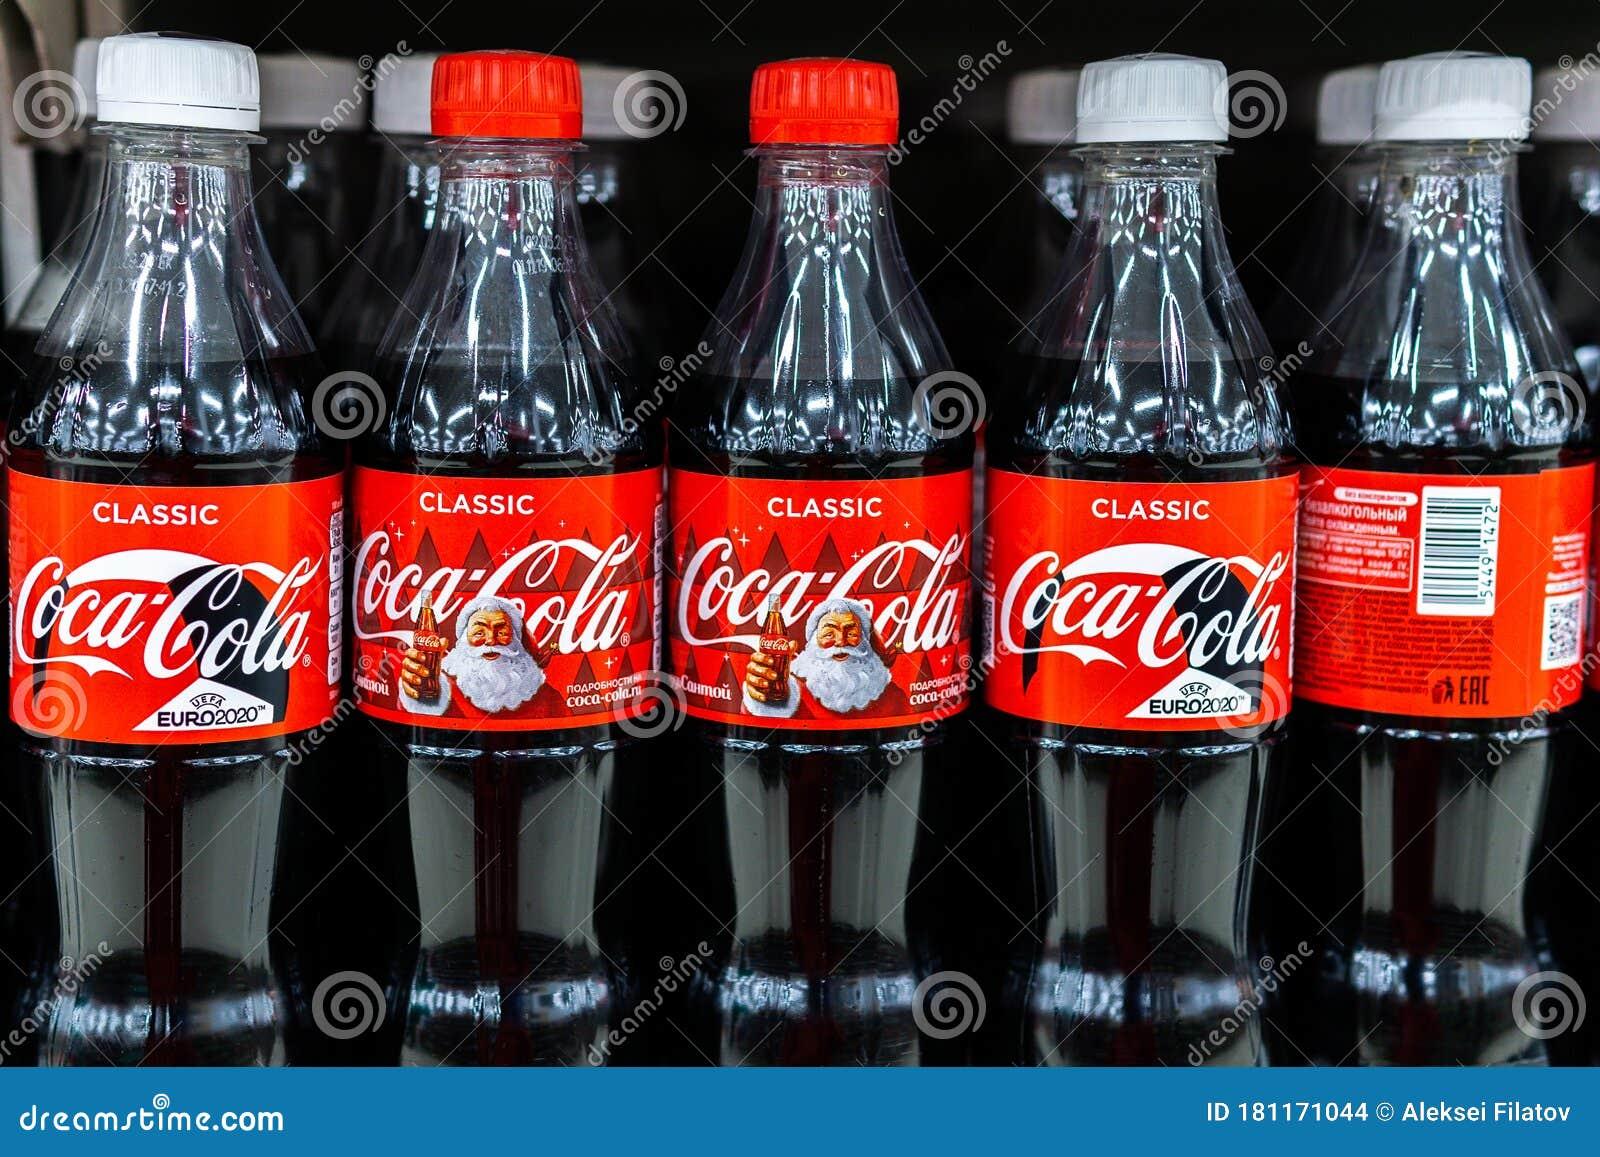 Coca Cola Christmas Bottle 2020 Tyumen, Russia April 26, 2020: Close Up Of Coca cola Bottles